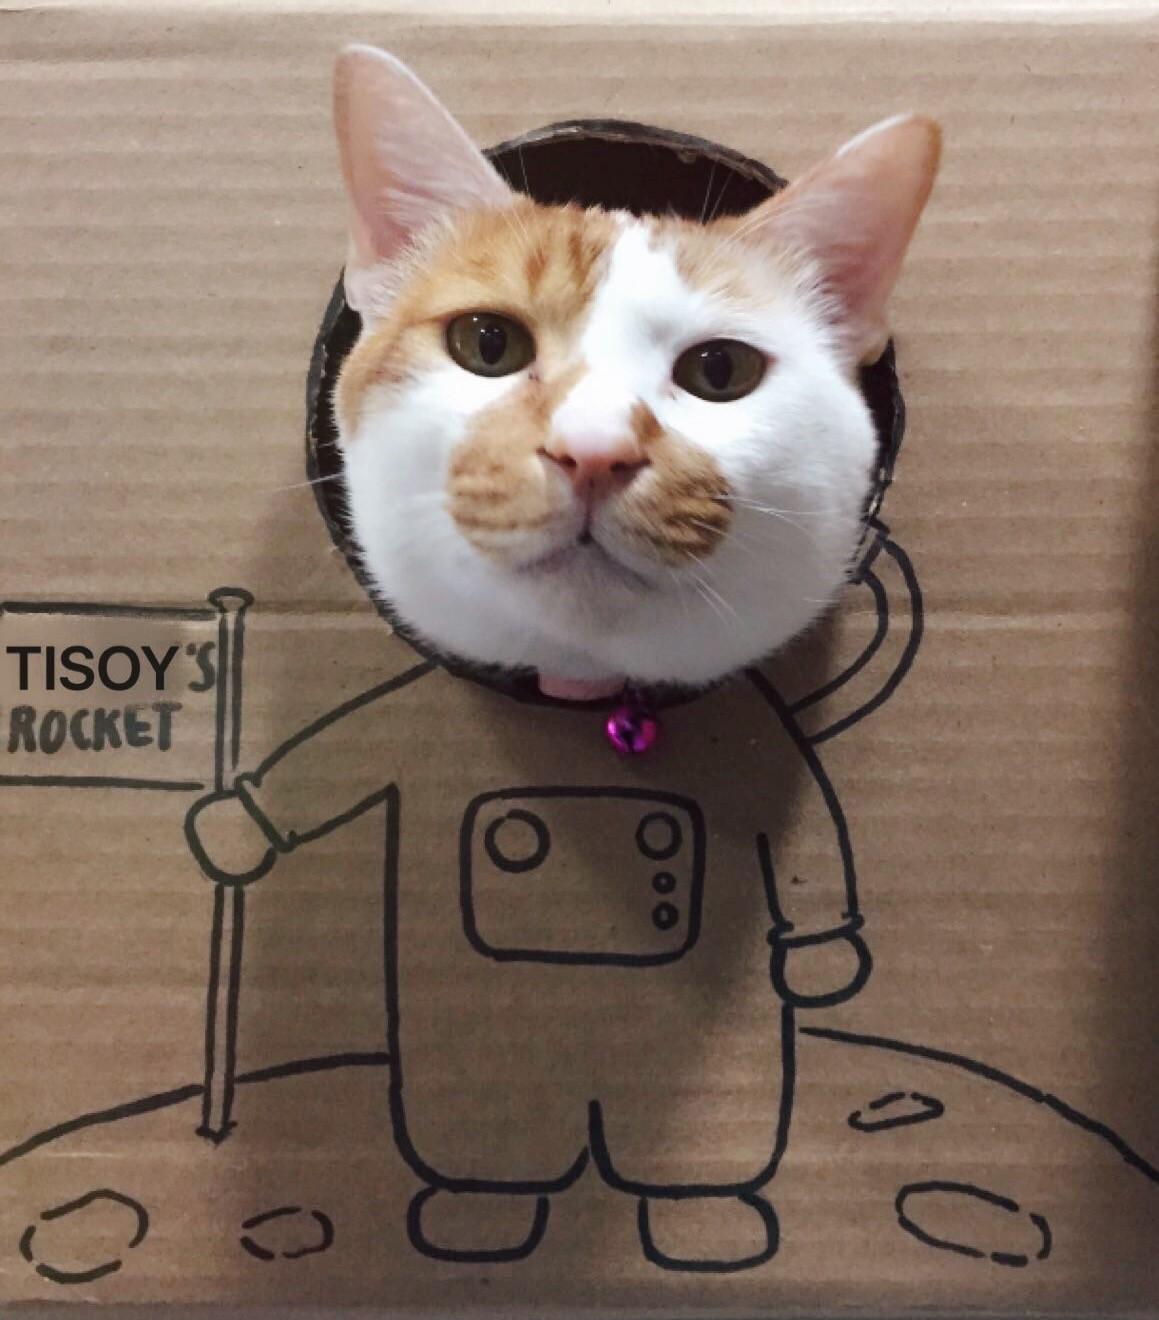 Tisoy as a spaceman